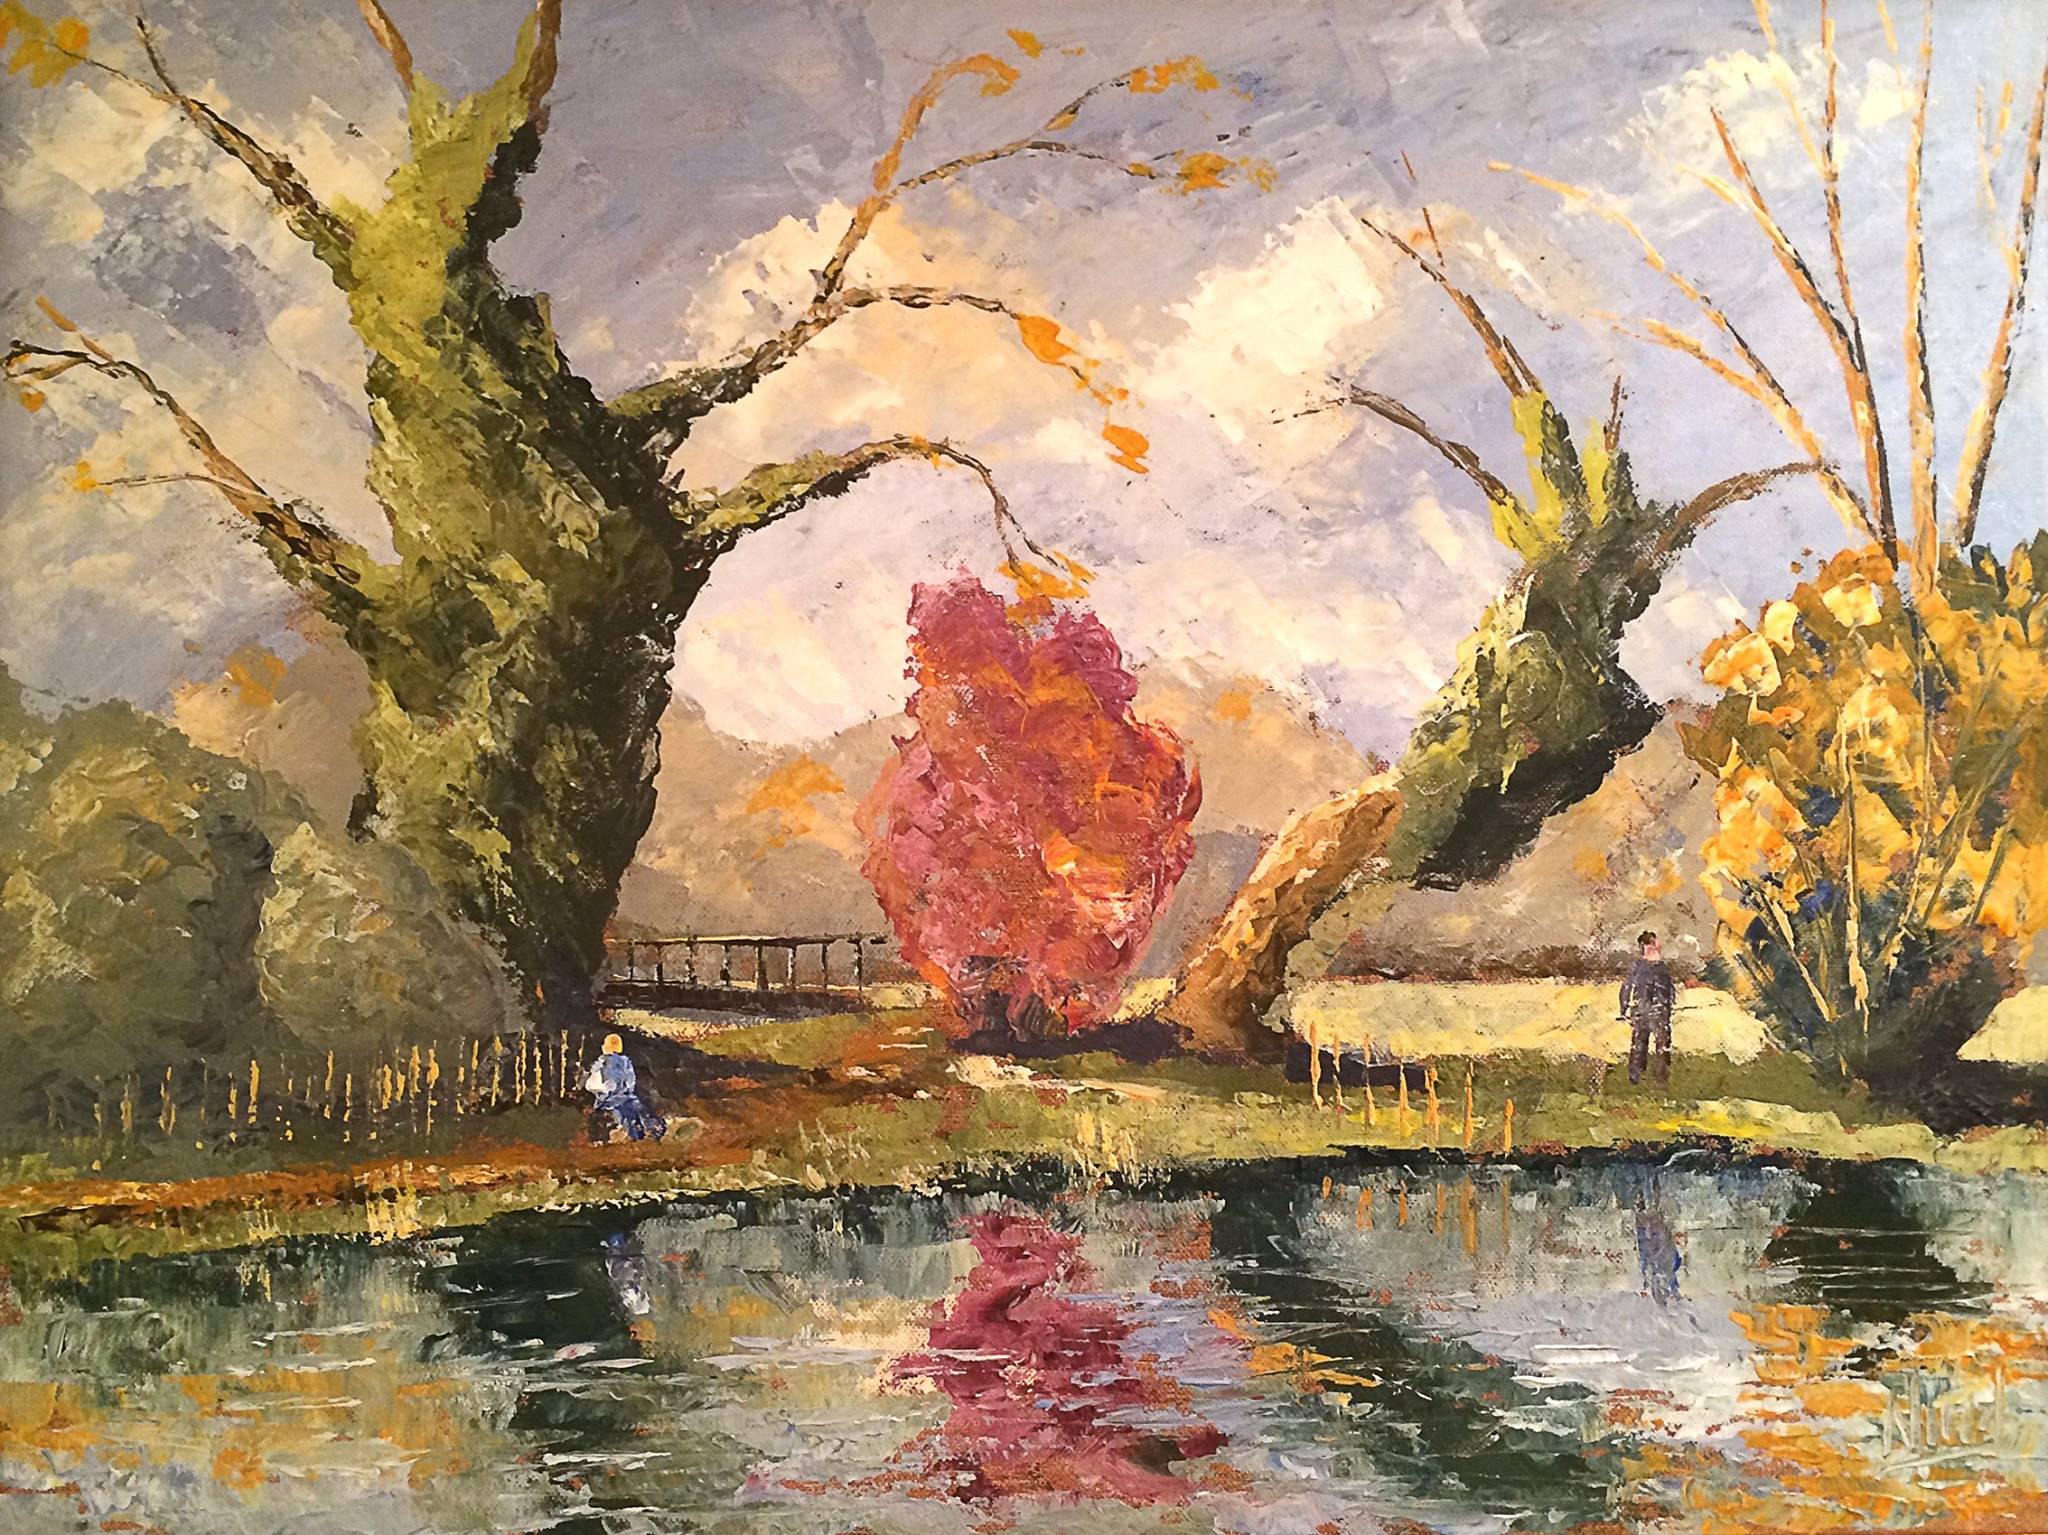 Lost Summer by Leslie Nind